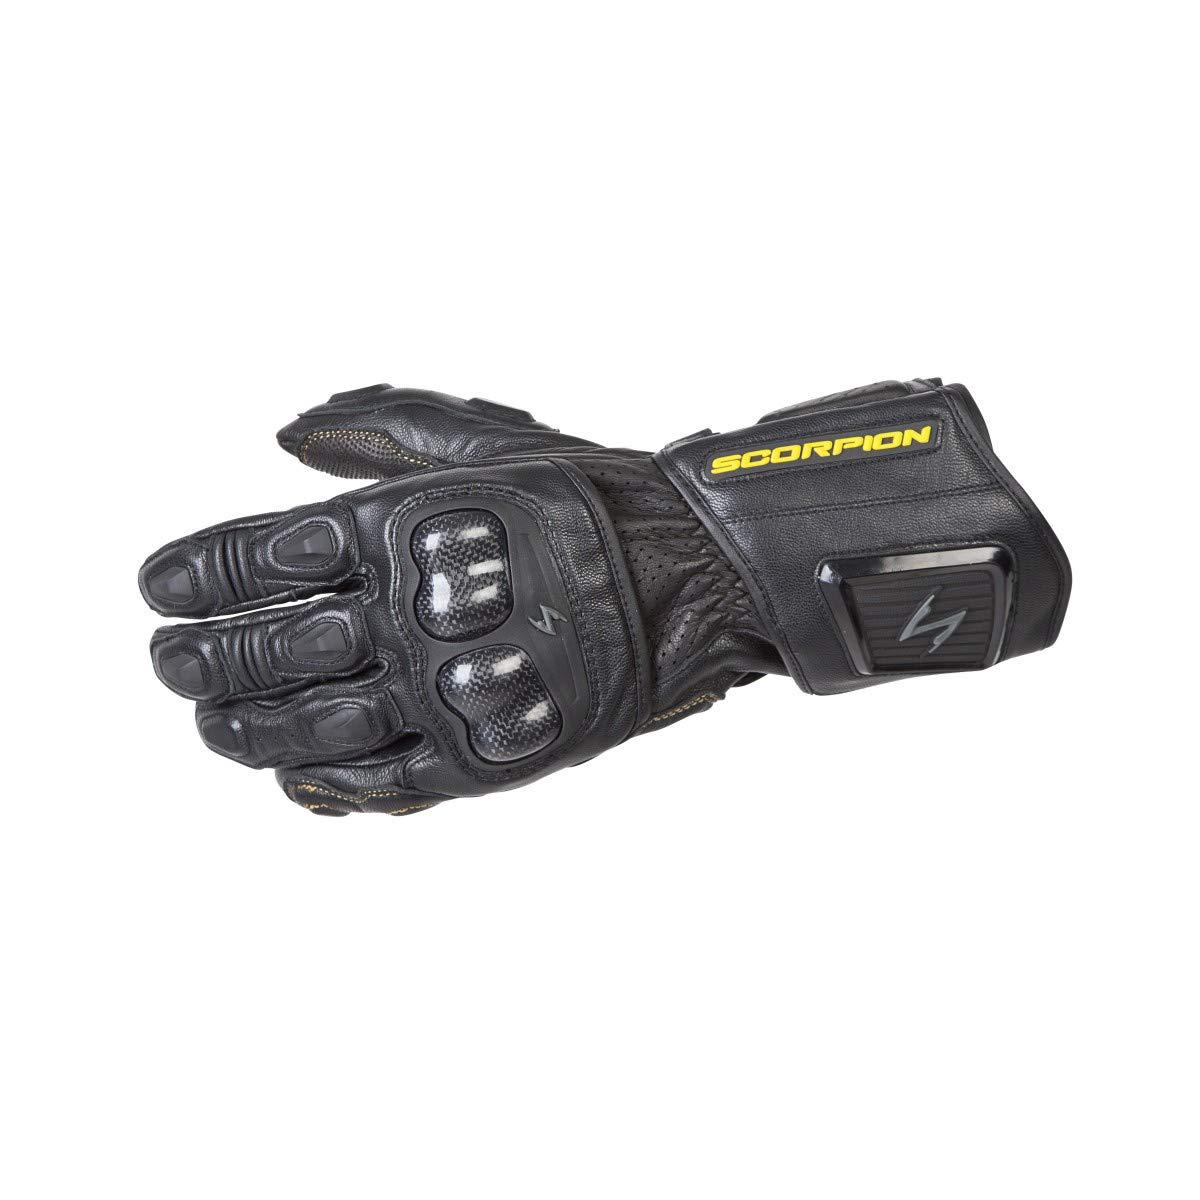 ScorpionExo SG3 MKII Men's Long Gauntlet Sport Gloves (Black, X-Large)